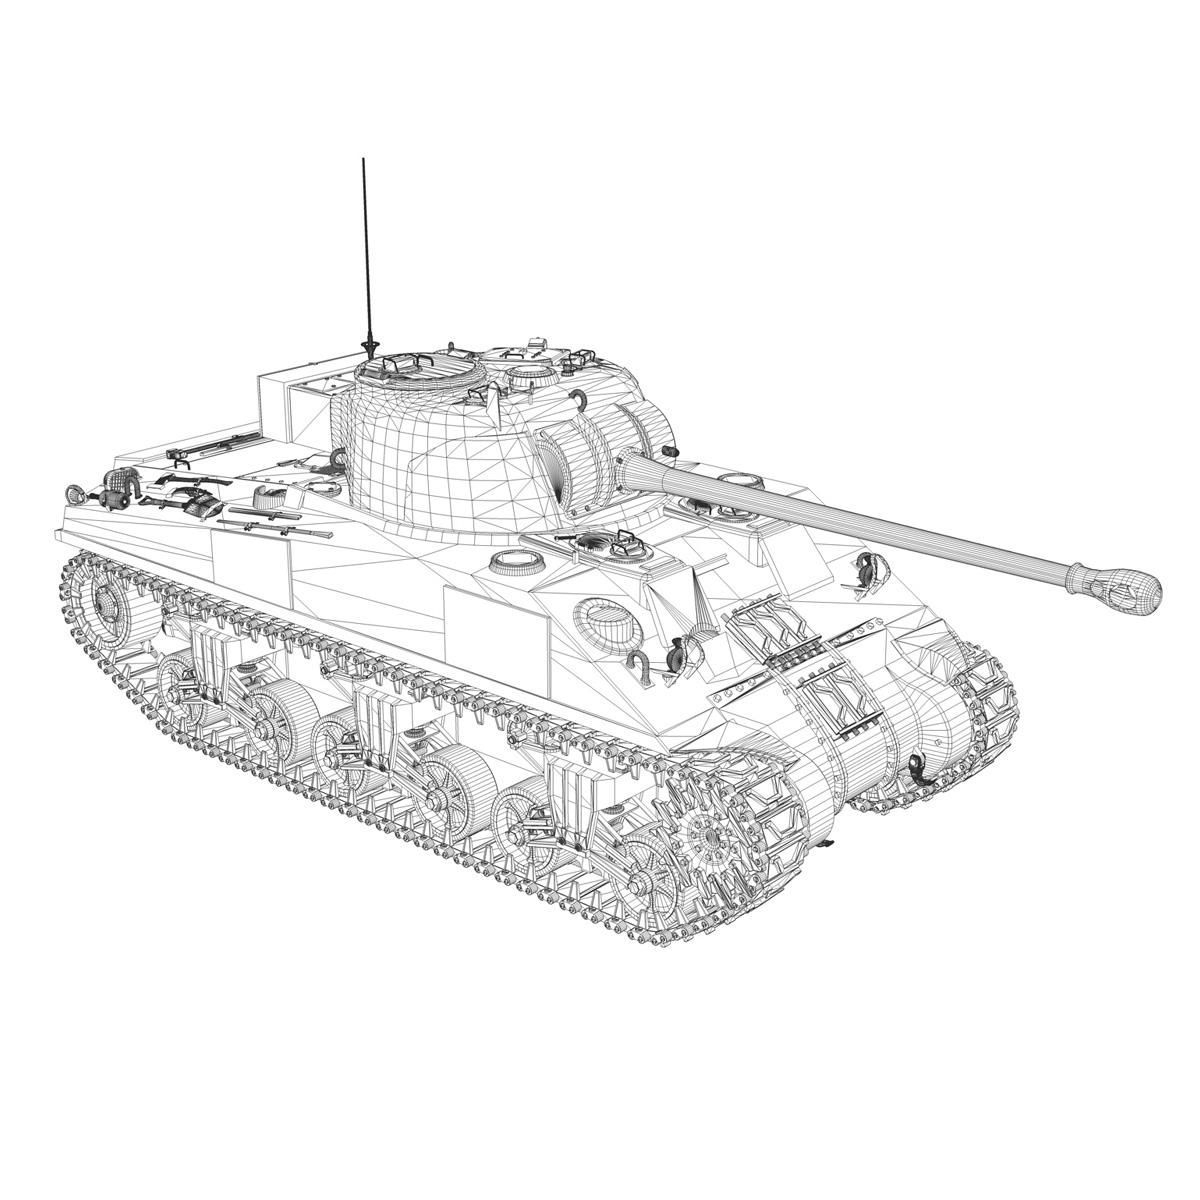 Sherman MK VC Firefly - Beldevere 3d model  266024